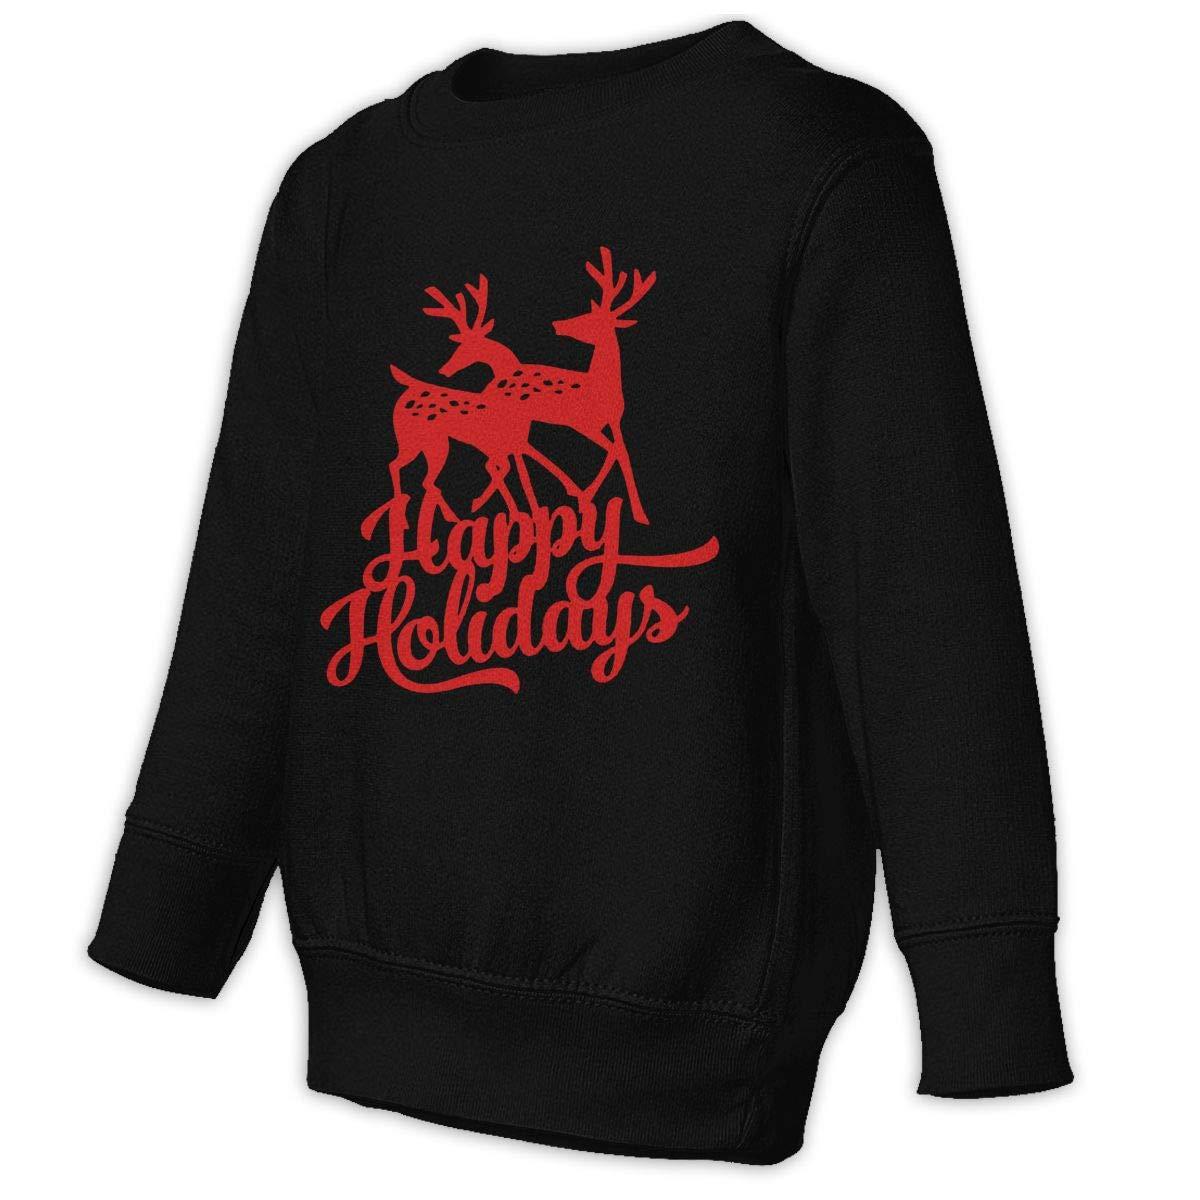 NMDJC CCQ Happy Holiday Christmas Reindeer Baby Sweatshirt Fashion Juvenile Hoodies Comfortable Pullovers